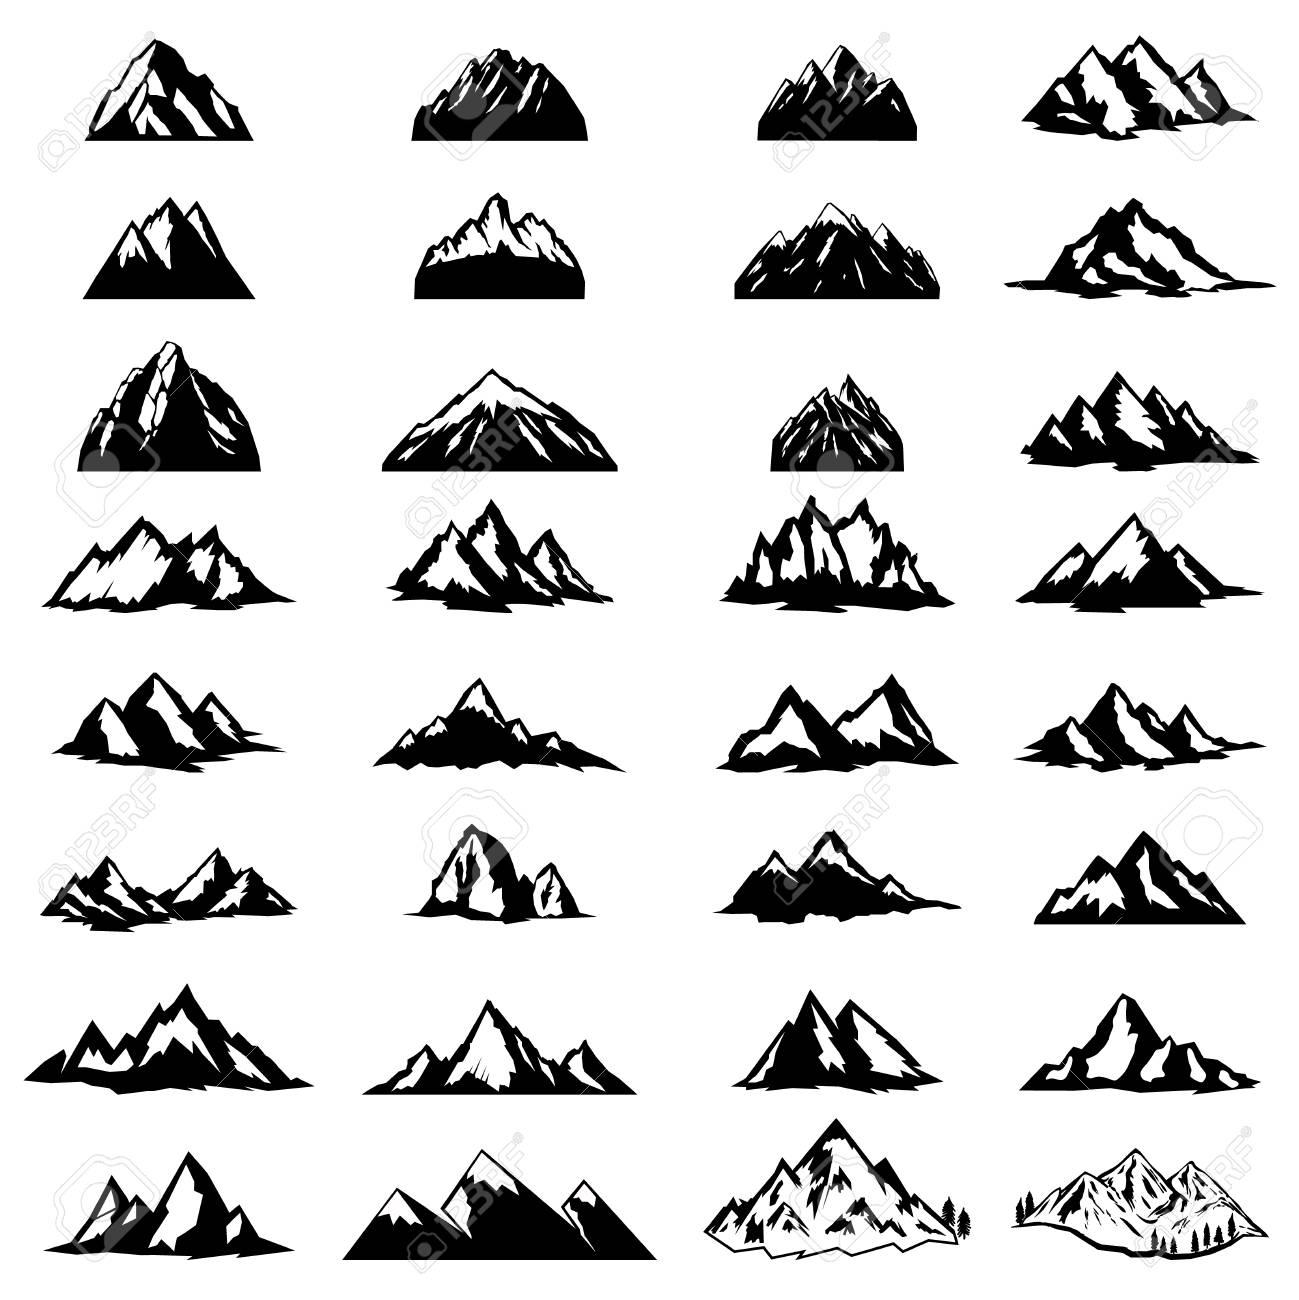 Big set of mountain icons isolated on white background. Design elements for logo, label, emblem, sign. Vector illustration - 94768293